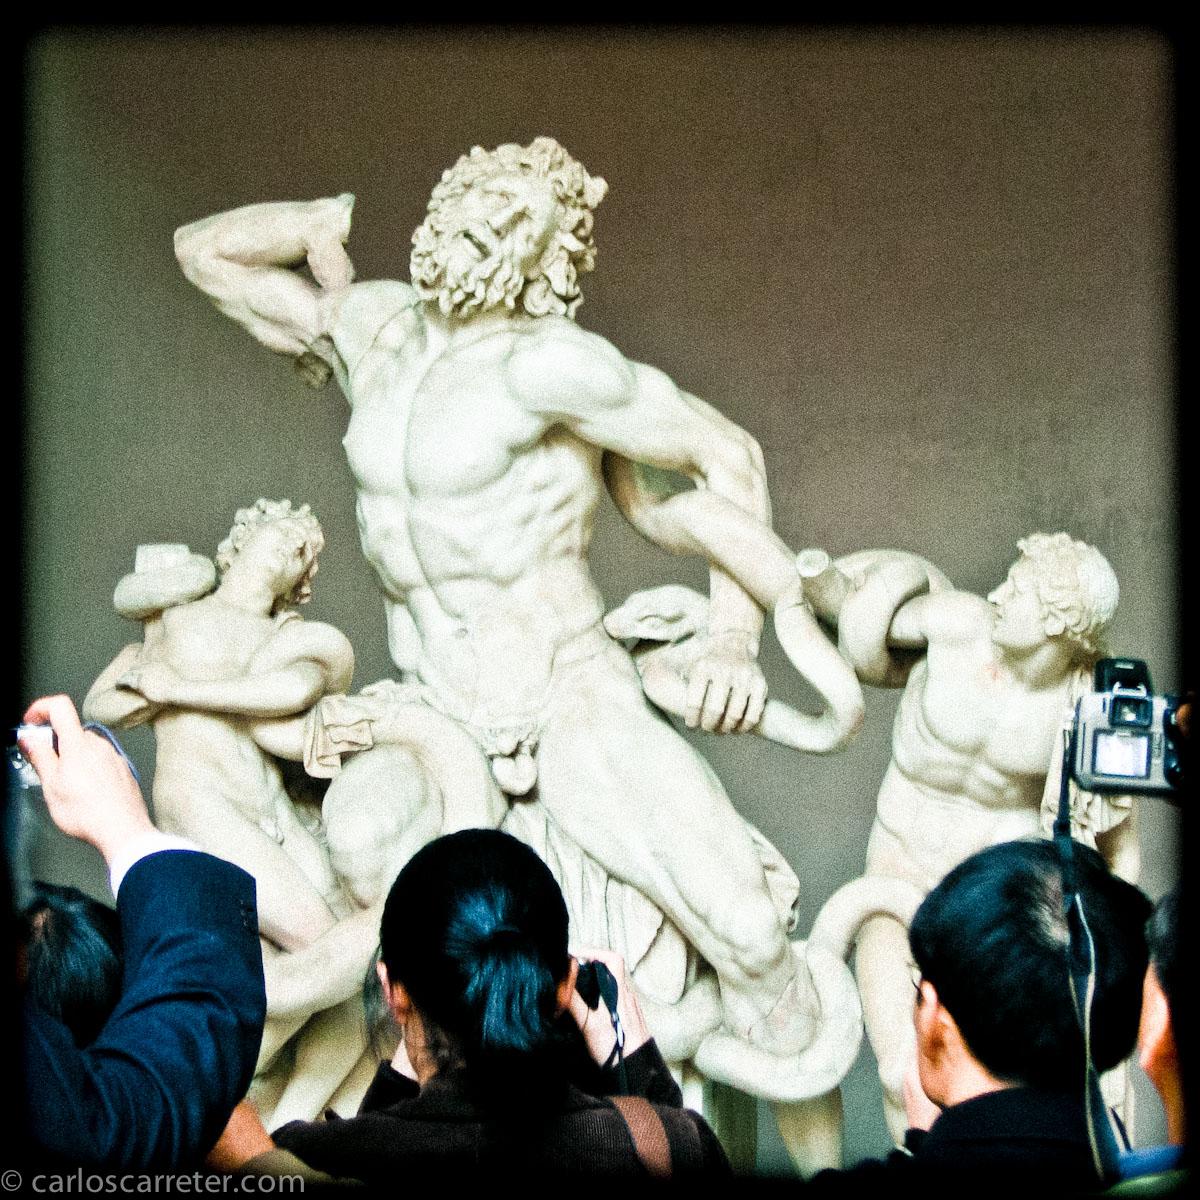 Laocoonte y sus hijos - Musei Vaticani